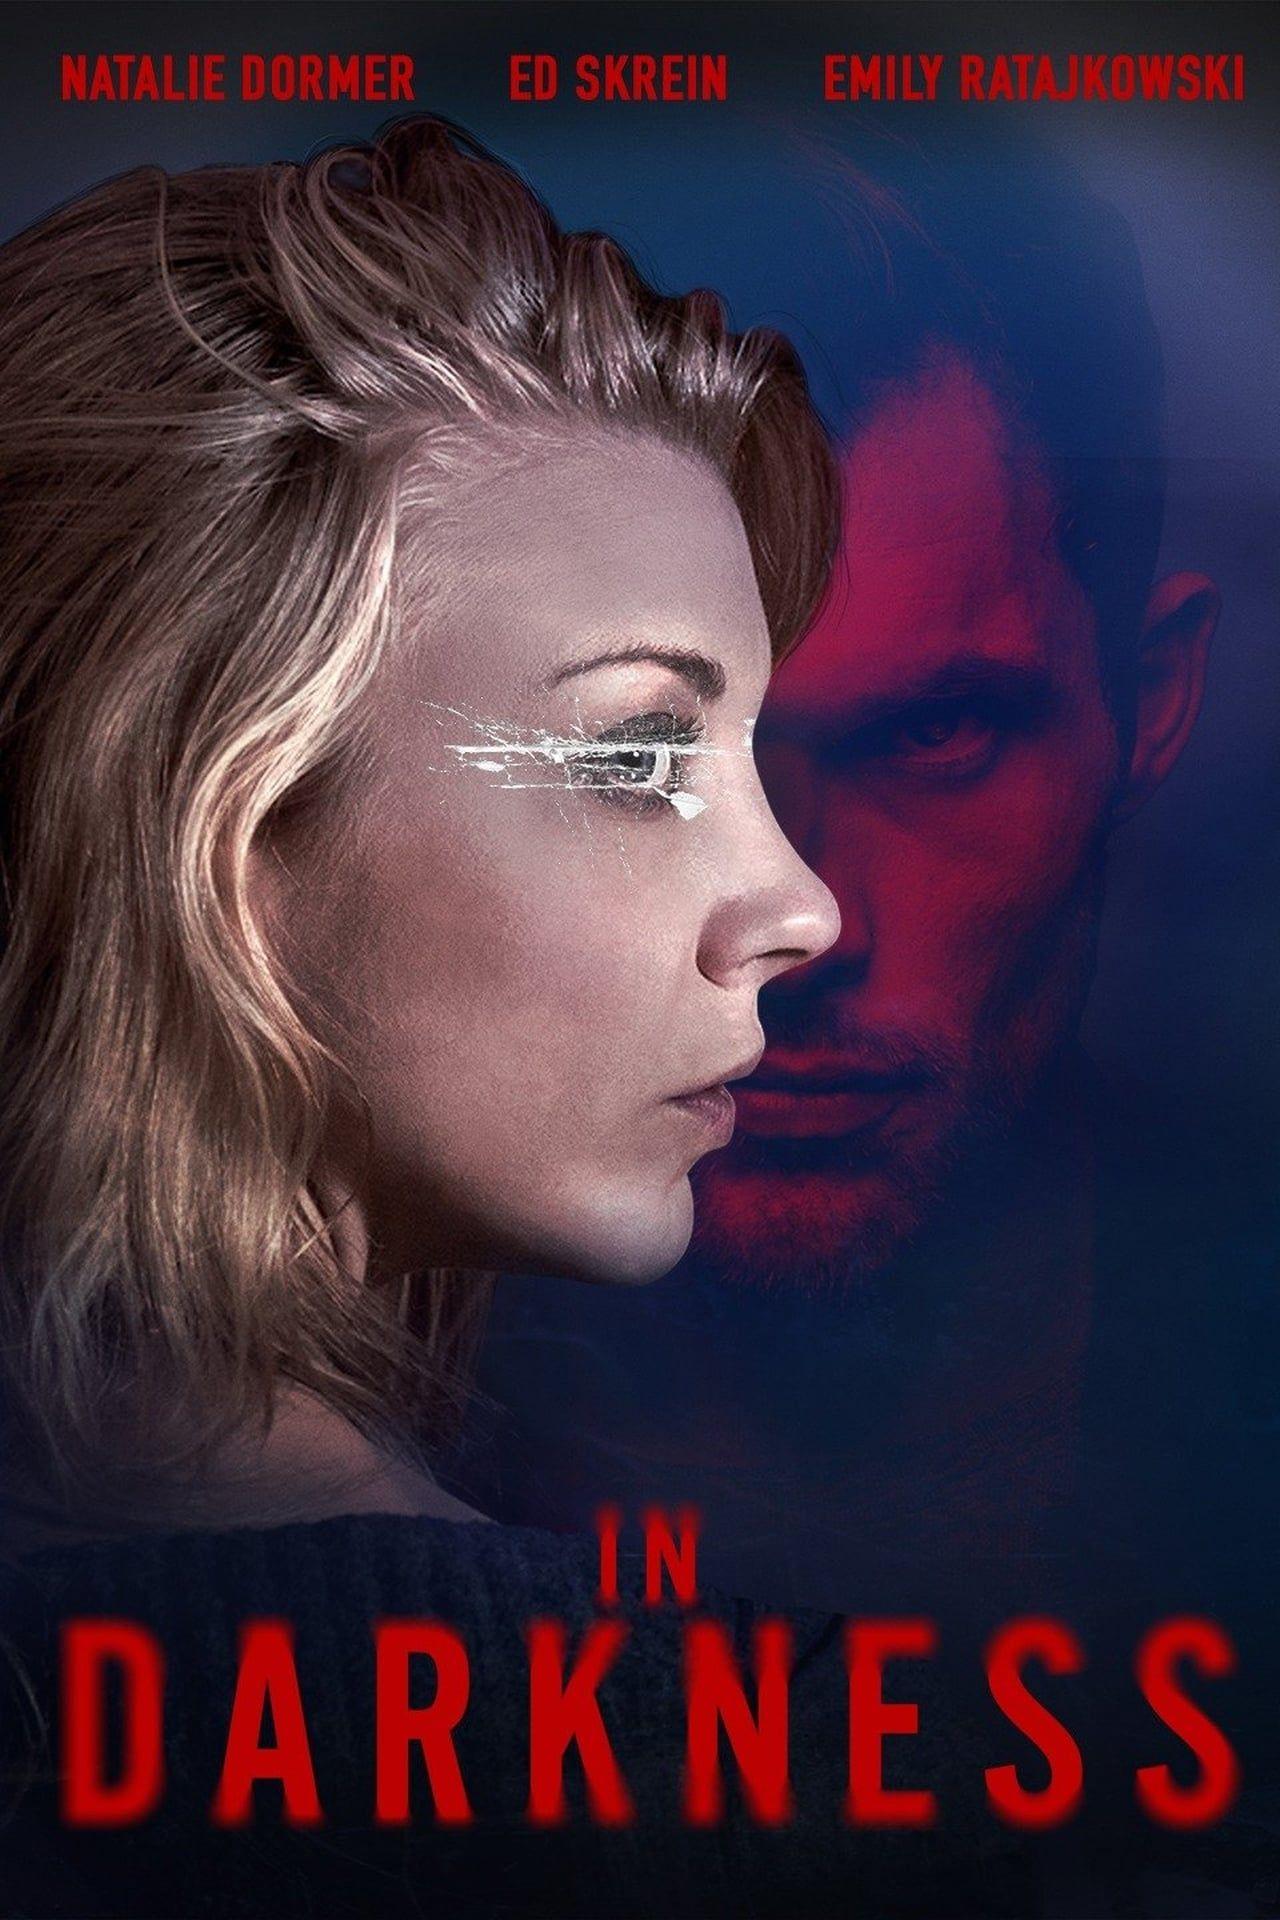 In Darkness Film Complet En Francais En Ligne Stream Complet In Darkness Hd Online Movie Free Arthouse Movies Full Movies Online Free Streaming Movies Online